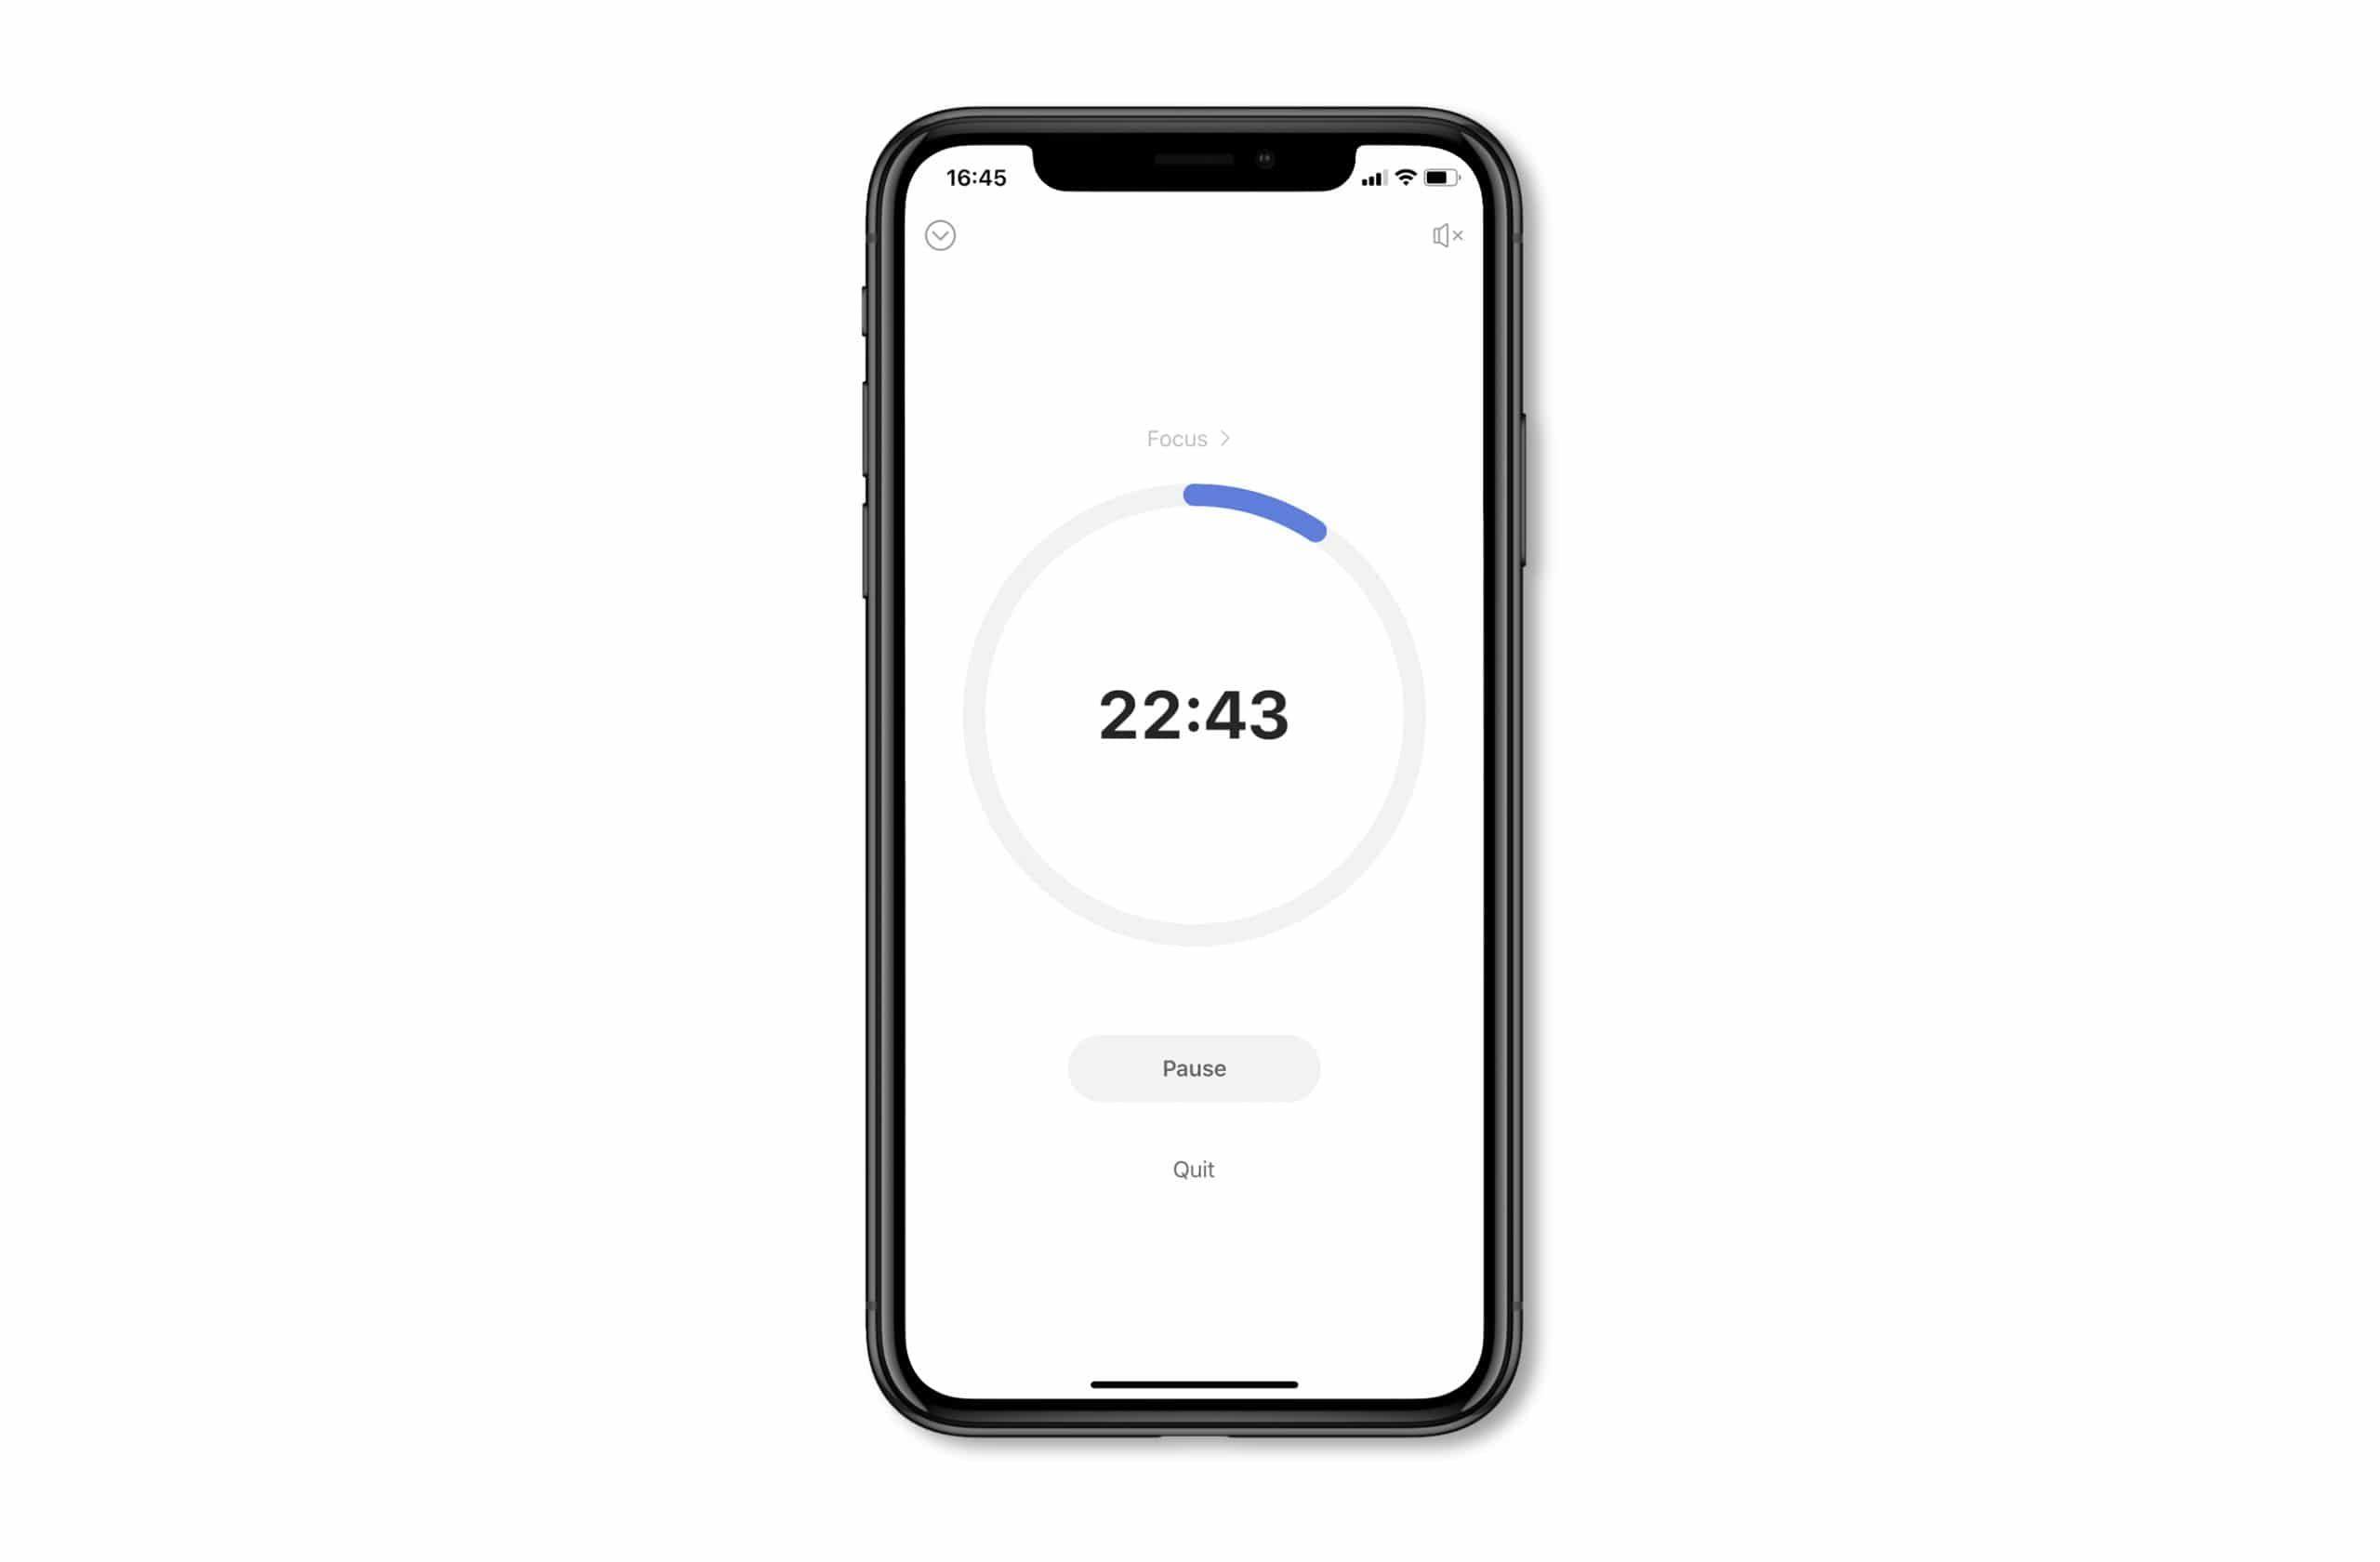 reloj-pomodoro-tick-tick-1-scaled.jpg